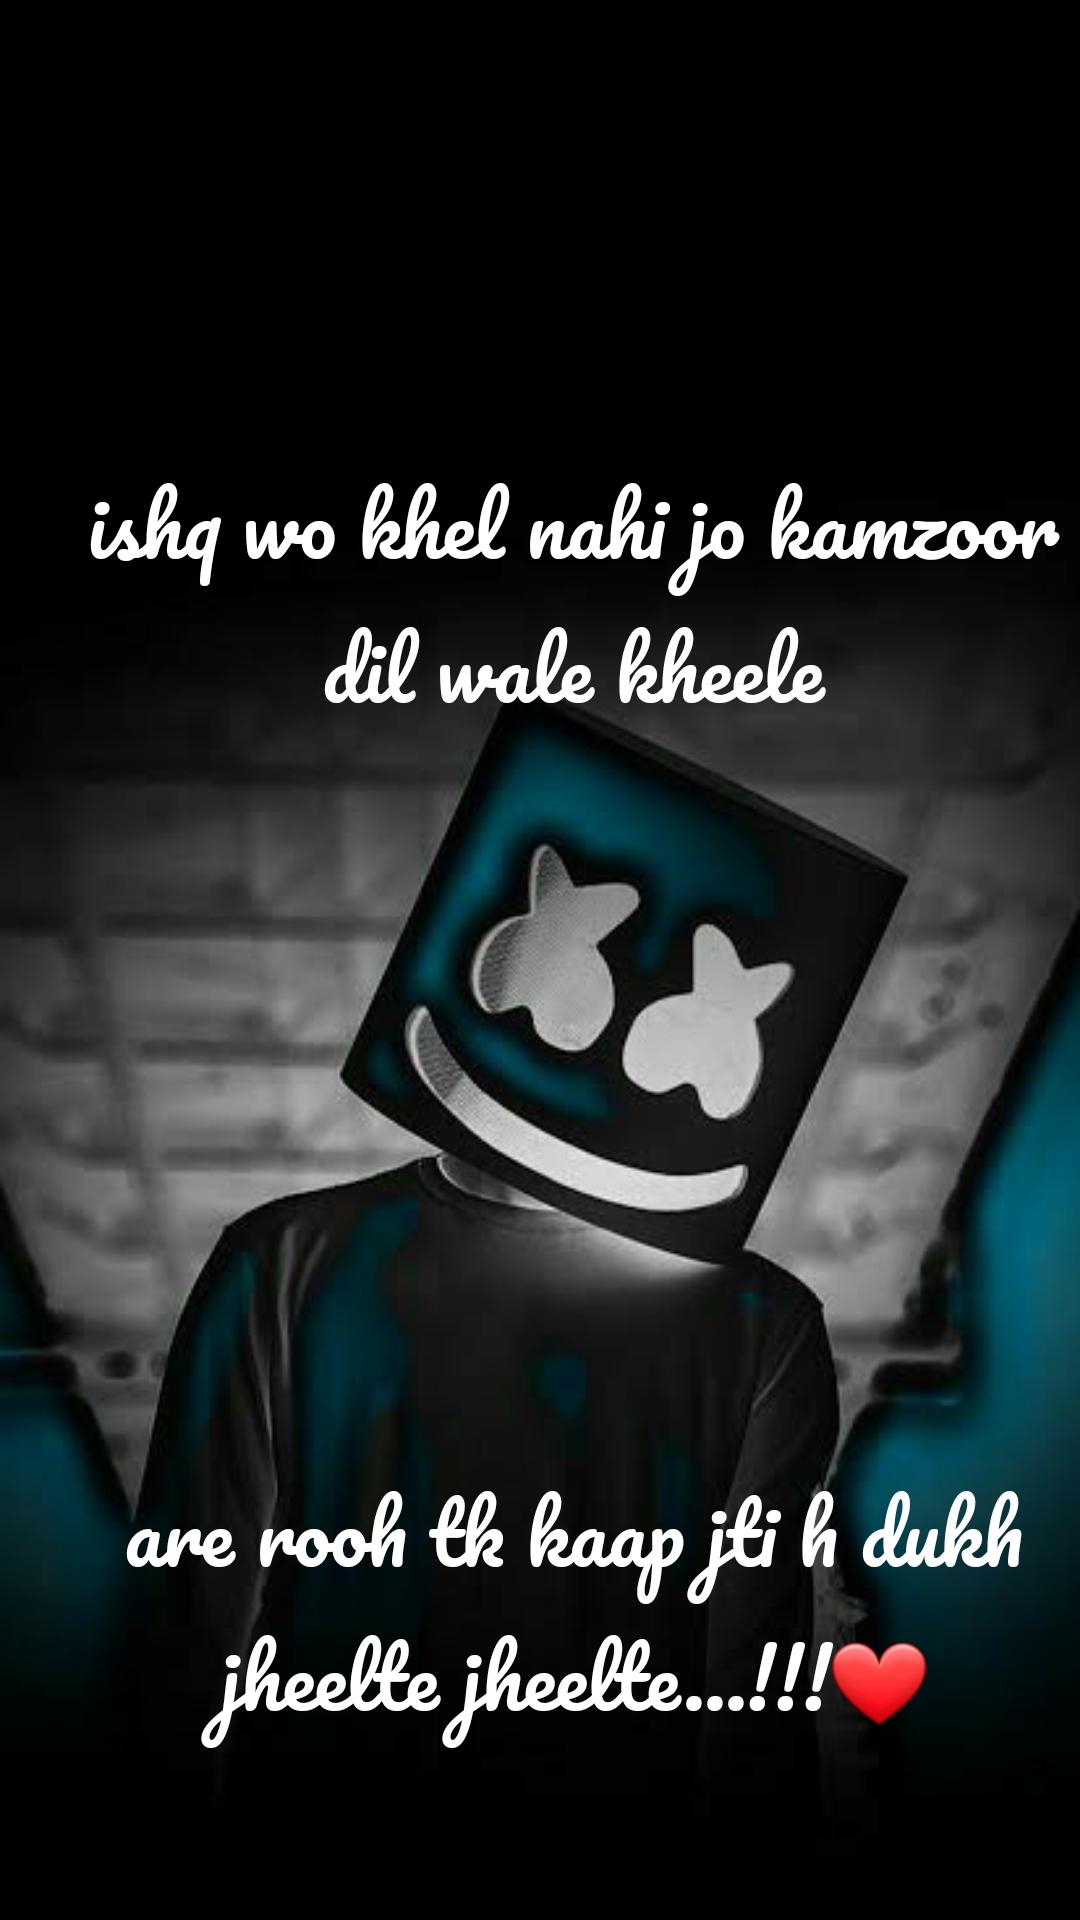 ishq wo khel nahi jo kamzoor dil wale kheele      are rooh tk kaap jti h dukh jheelte jheelte...!!!❤